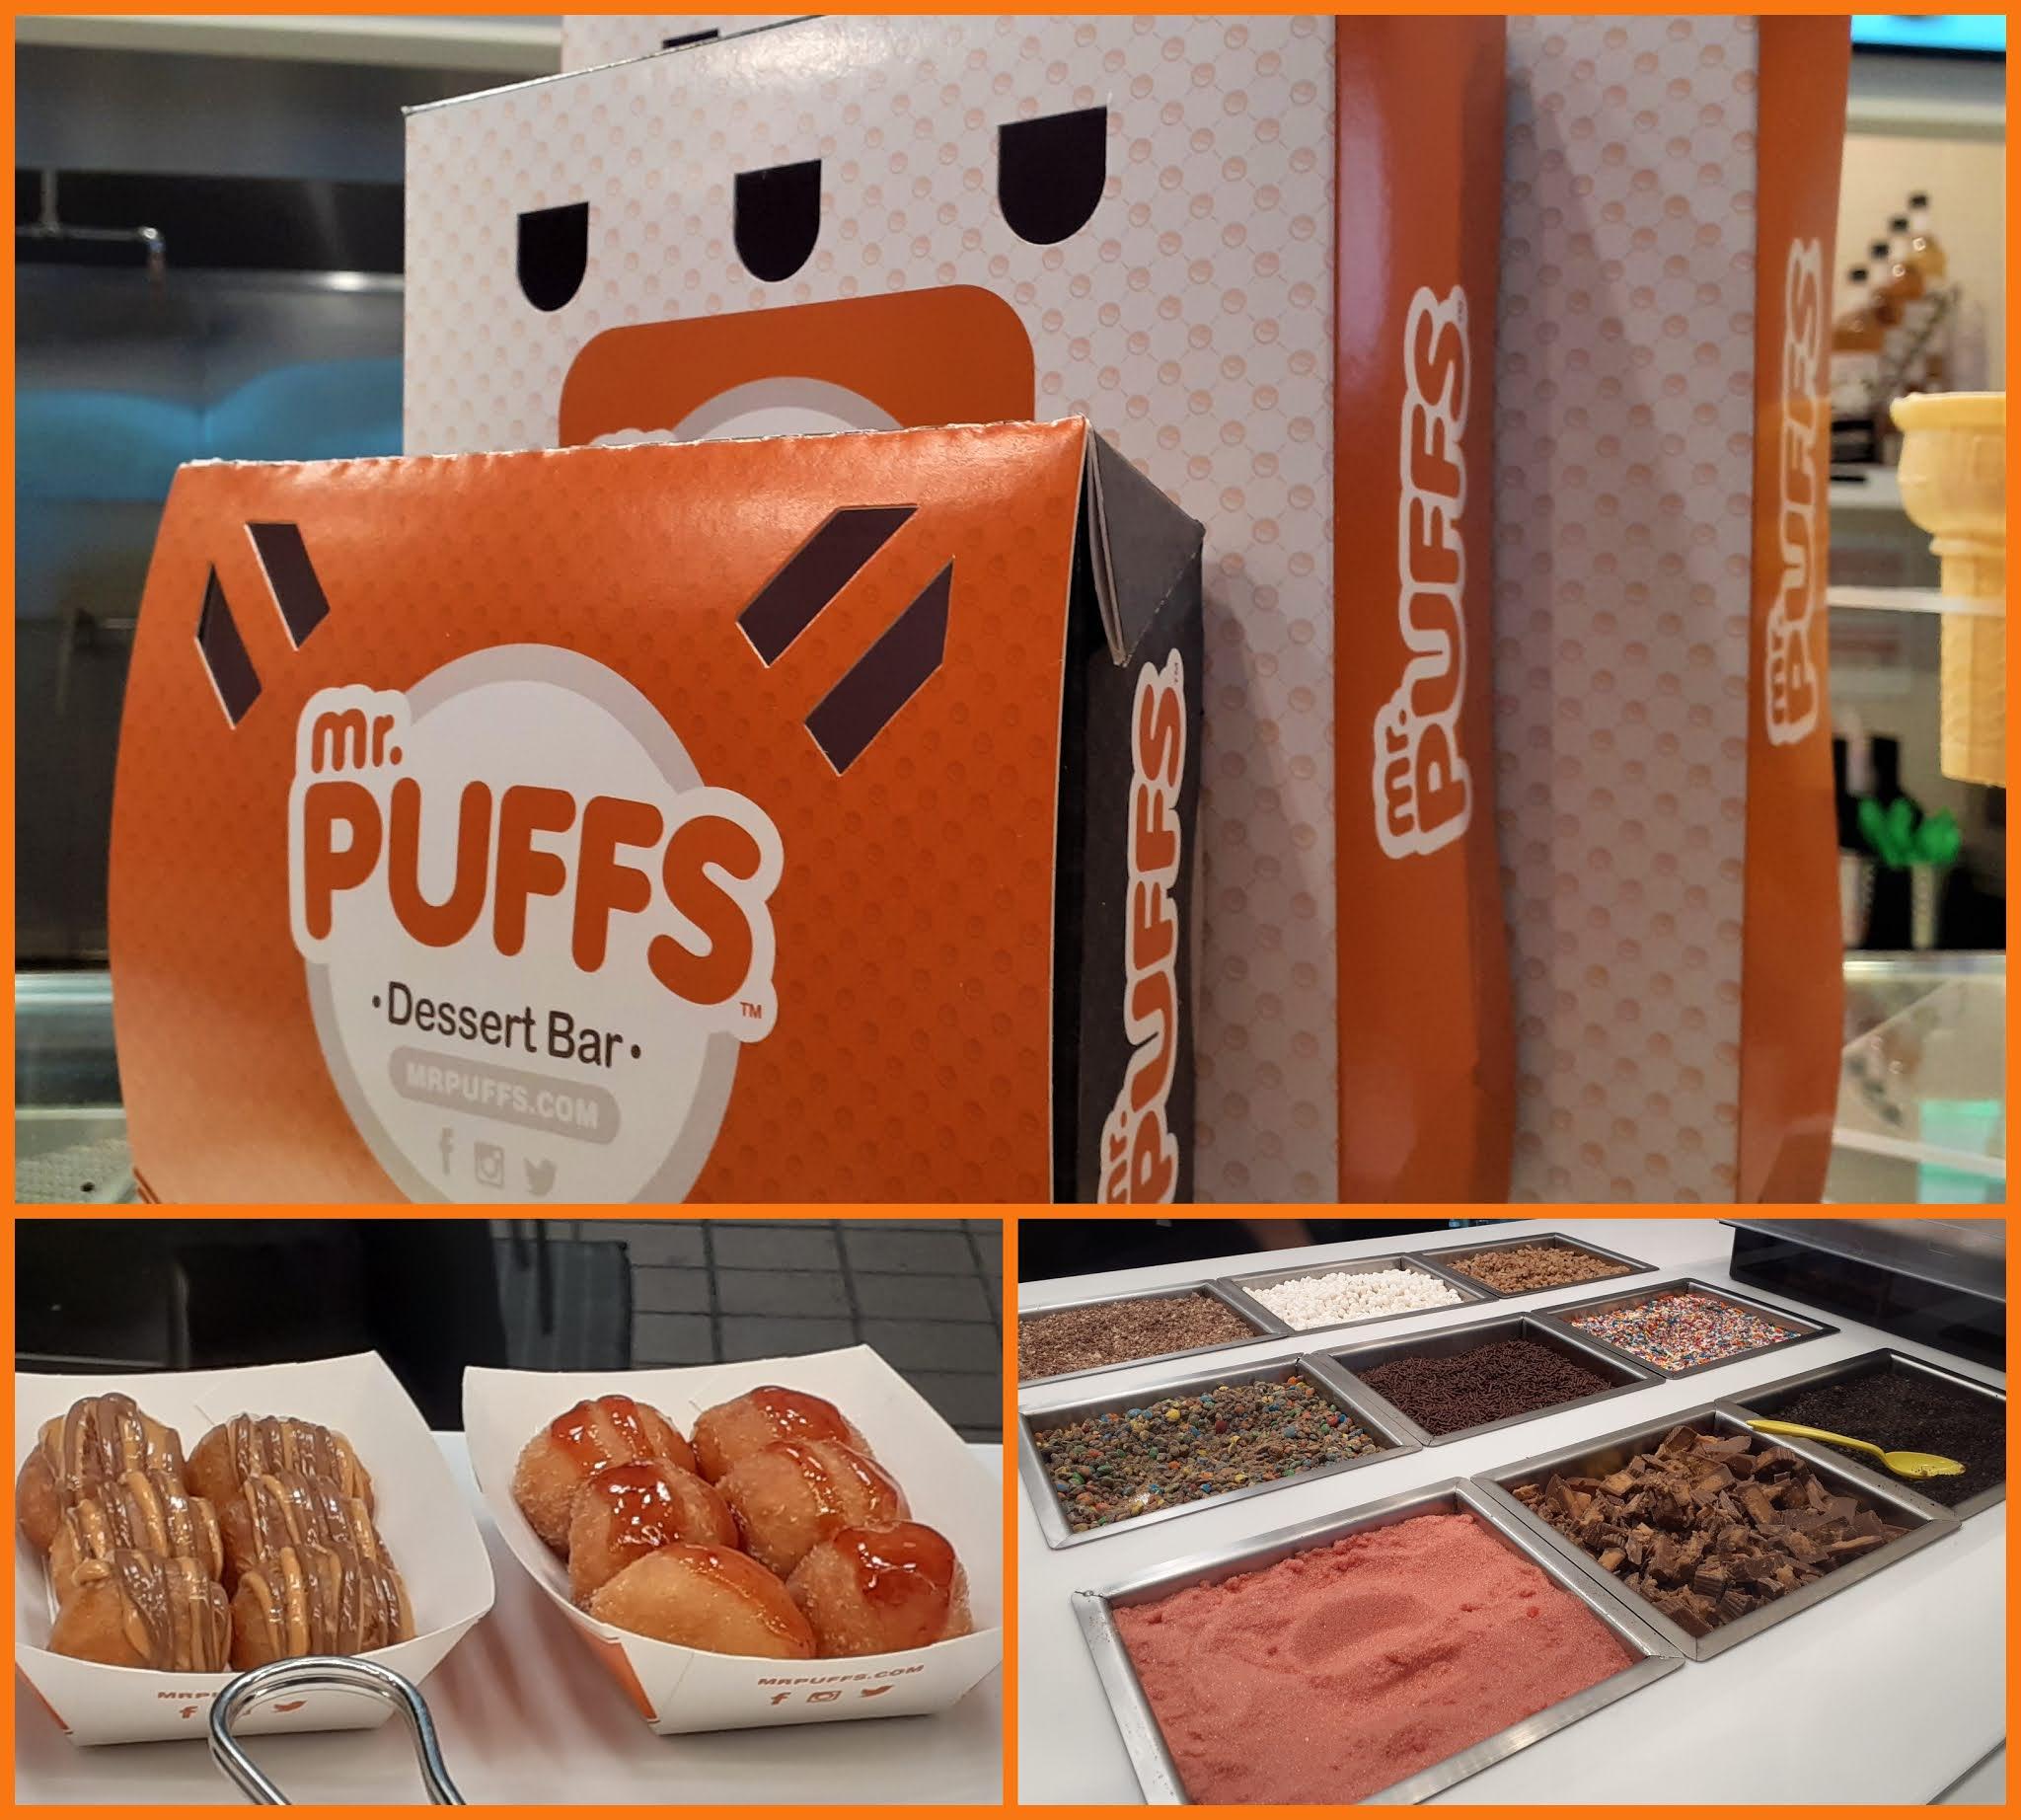 Review Mr Puffs Dessert Bar At The Florida Mall Nightmare (@mr_n1ghtmare) в tiktok (тикток) | лайки: mr puffs dessert bar at the florida mall